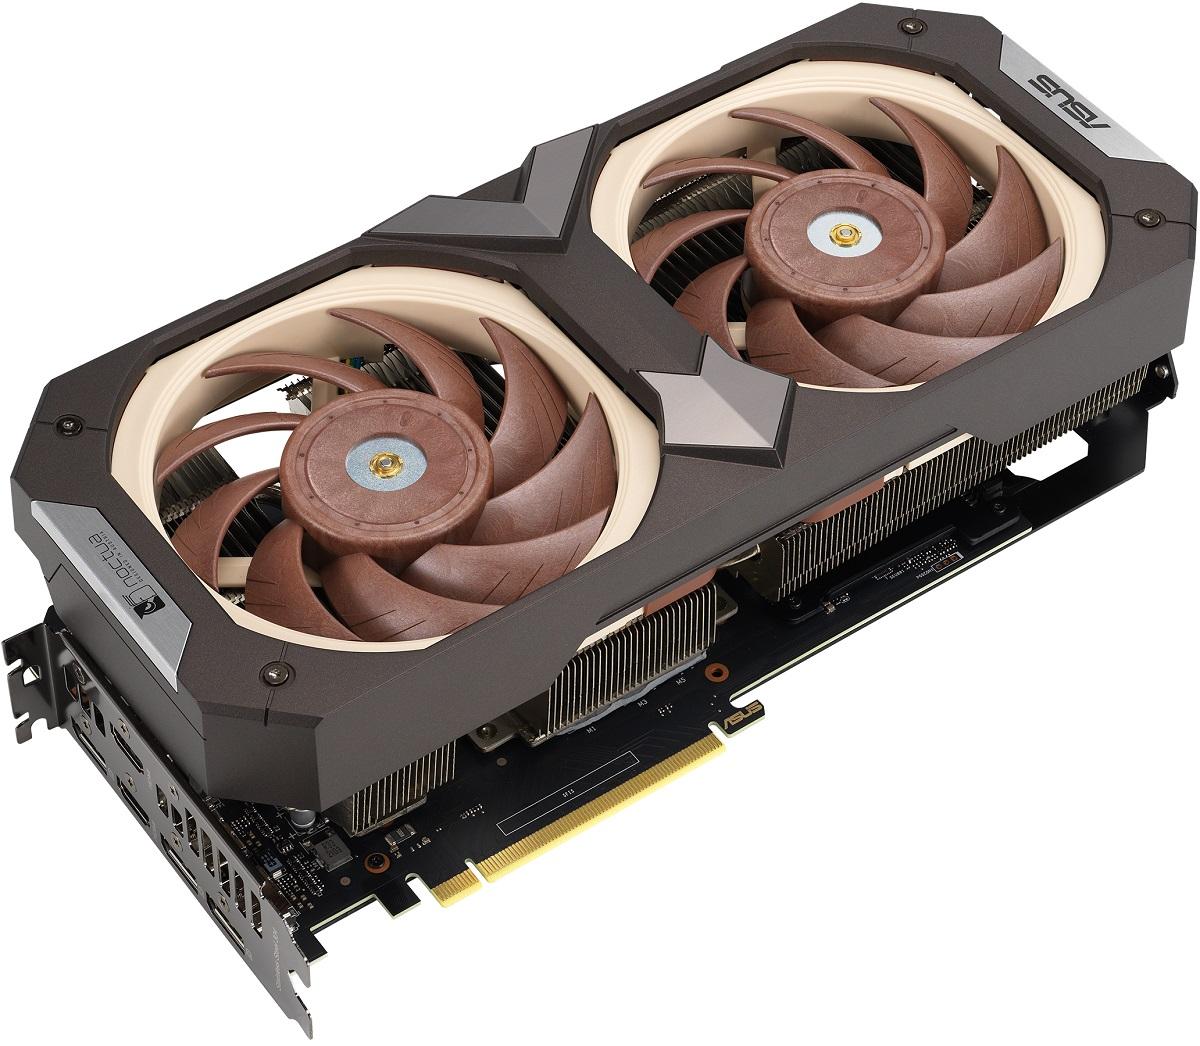 Видеокарта ASUS GeForce RTX 3070 Noctua Edition представлена официально